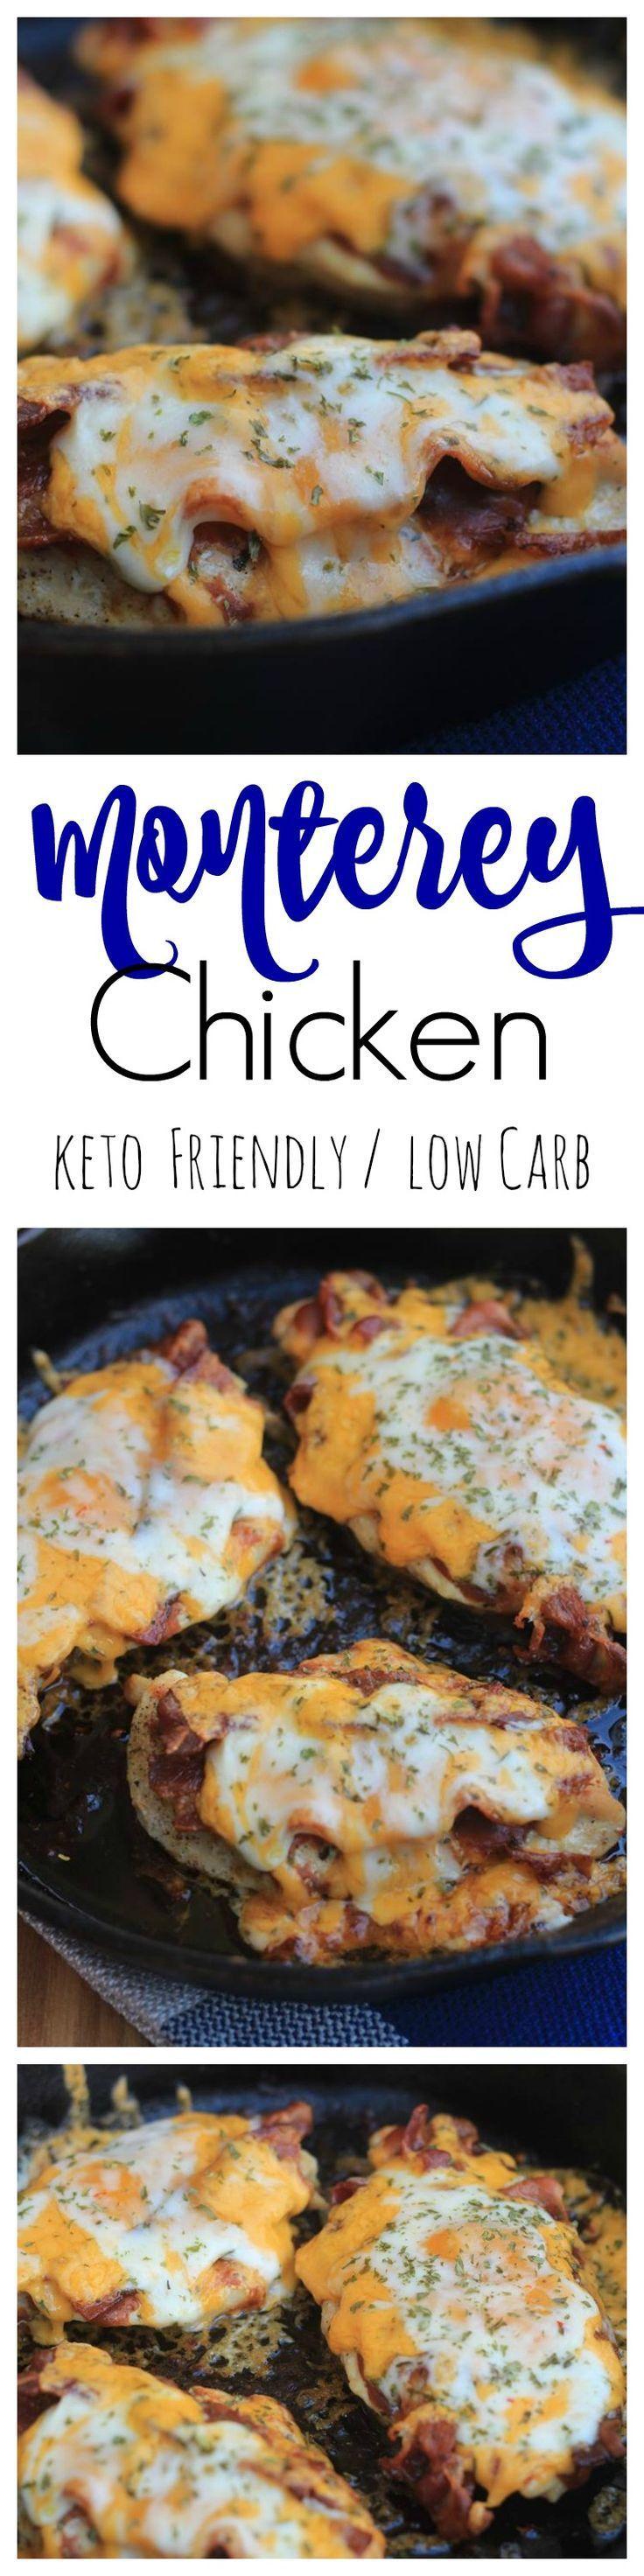 Monterey Chicken keto/Low Carb / keto Chicken recipe /low carb recipe / lchf / Low Carb high fat / keto easy recipe / low carb easy recipe #keto #LowCarb #LCHF #ketogenic #recipes #kaseytrenum